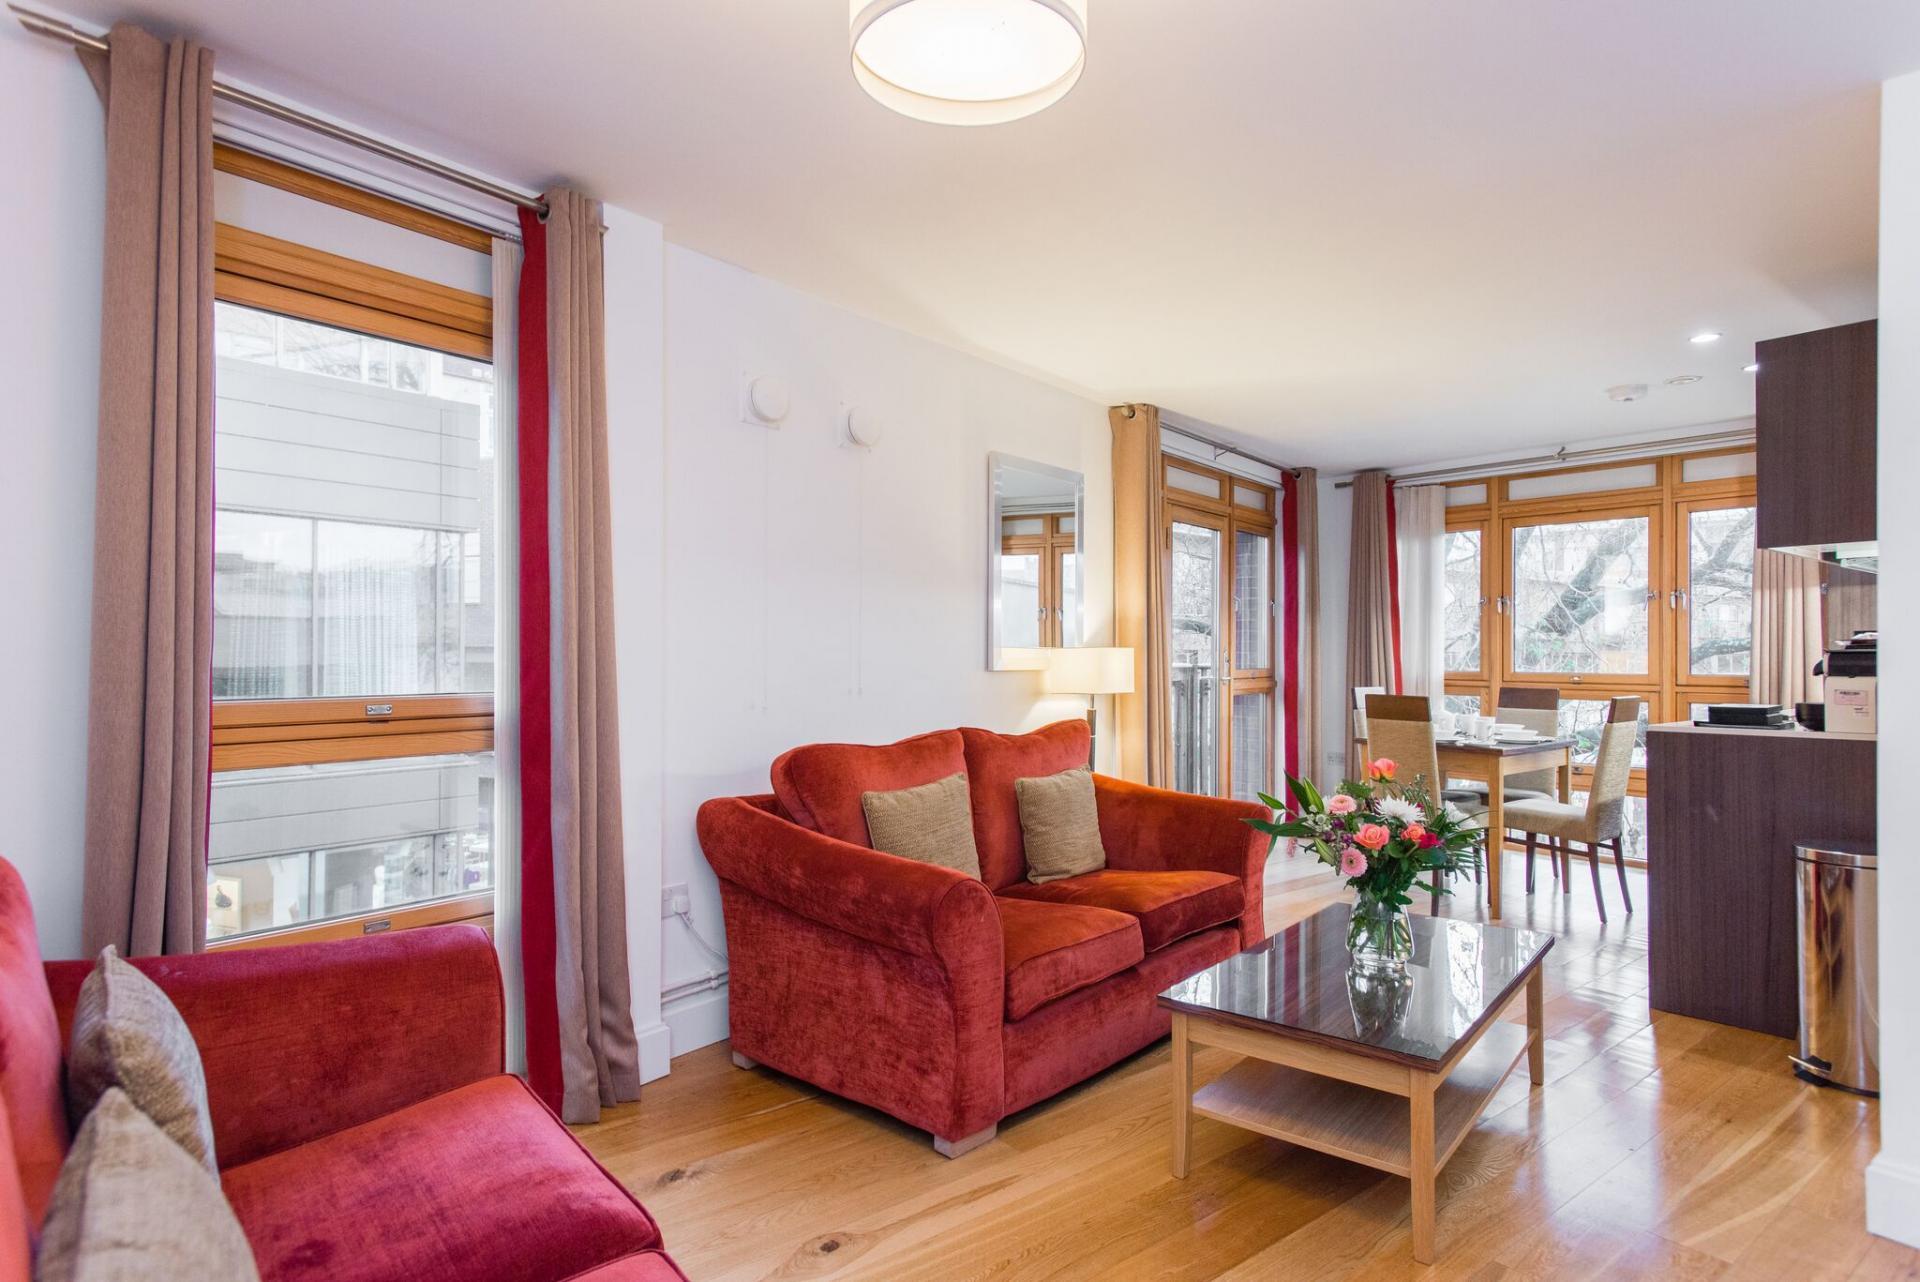 Lounge at Premier Suites Plus Cabot Circus - Citybase Apartments